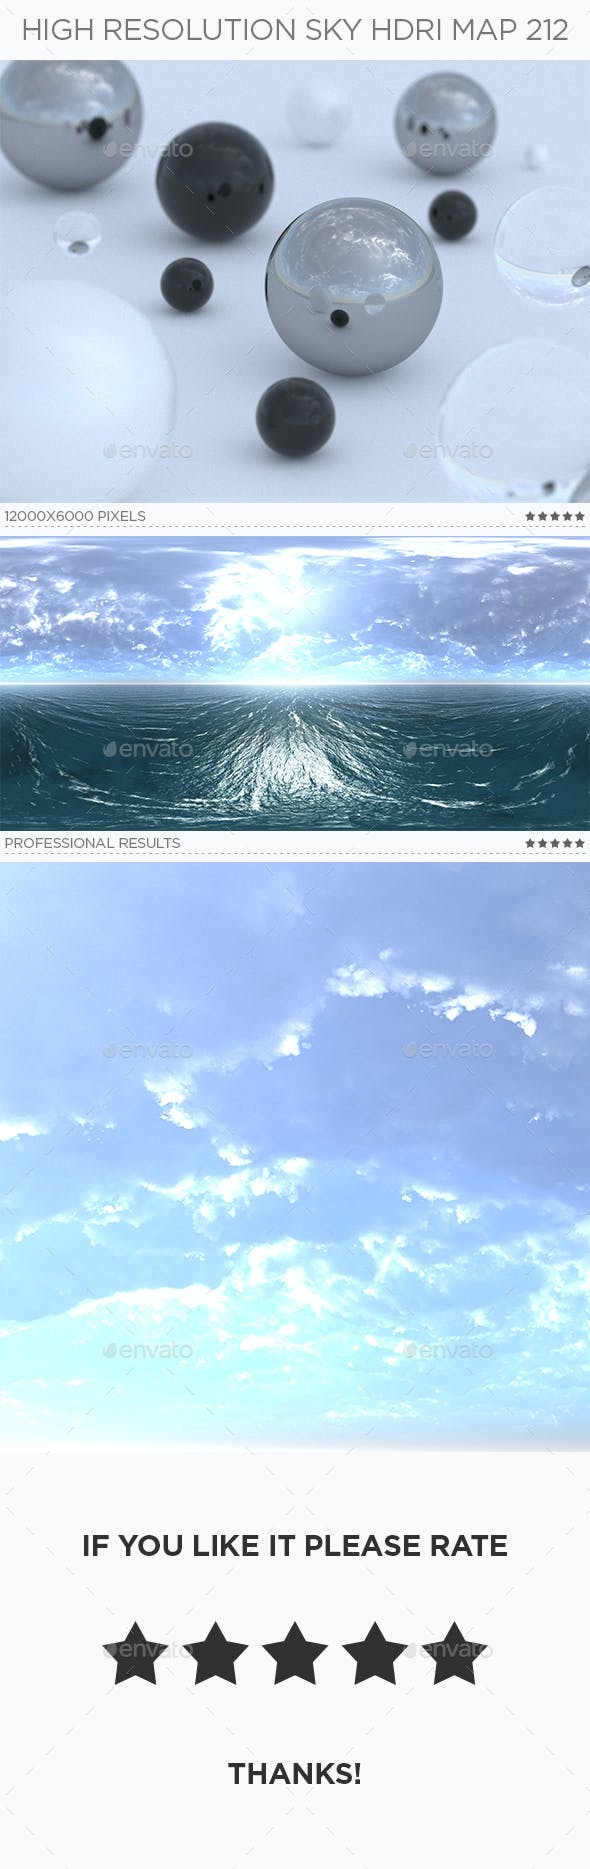 High Resolution Sky HDRi Map 212 - 3DOcean Item for Sale